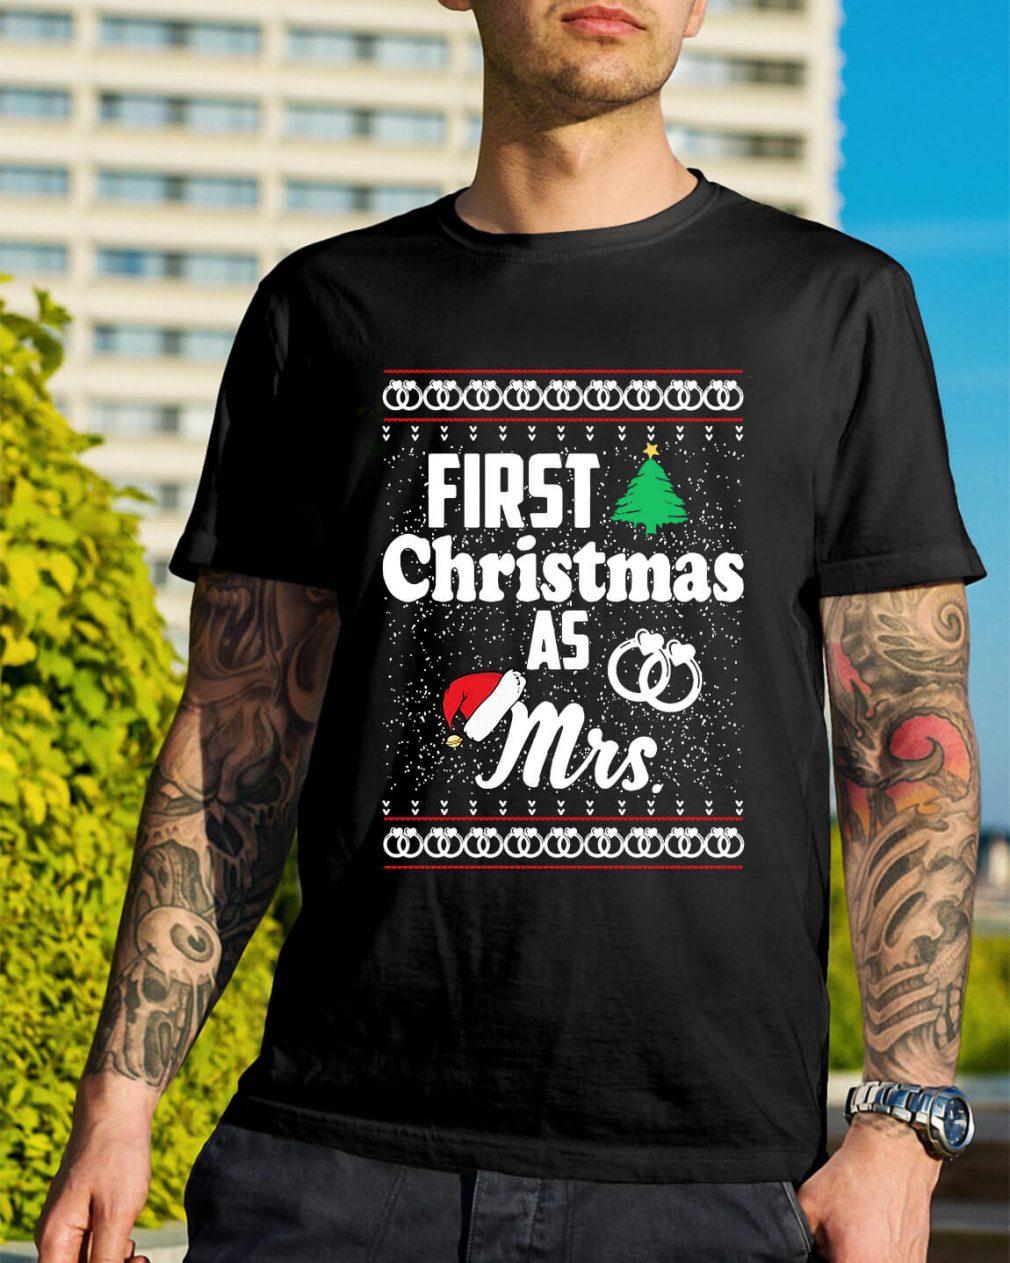 First Christmas as Mrs wedding ring Guys Shirt